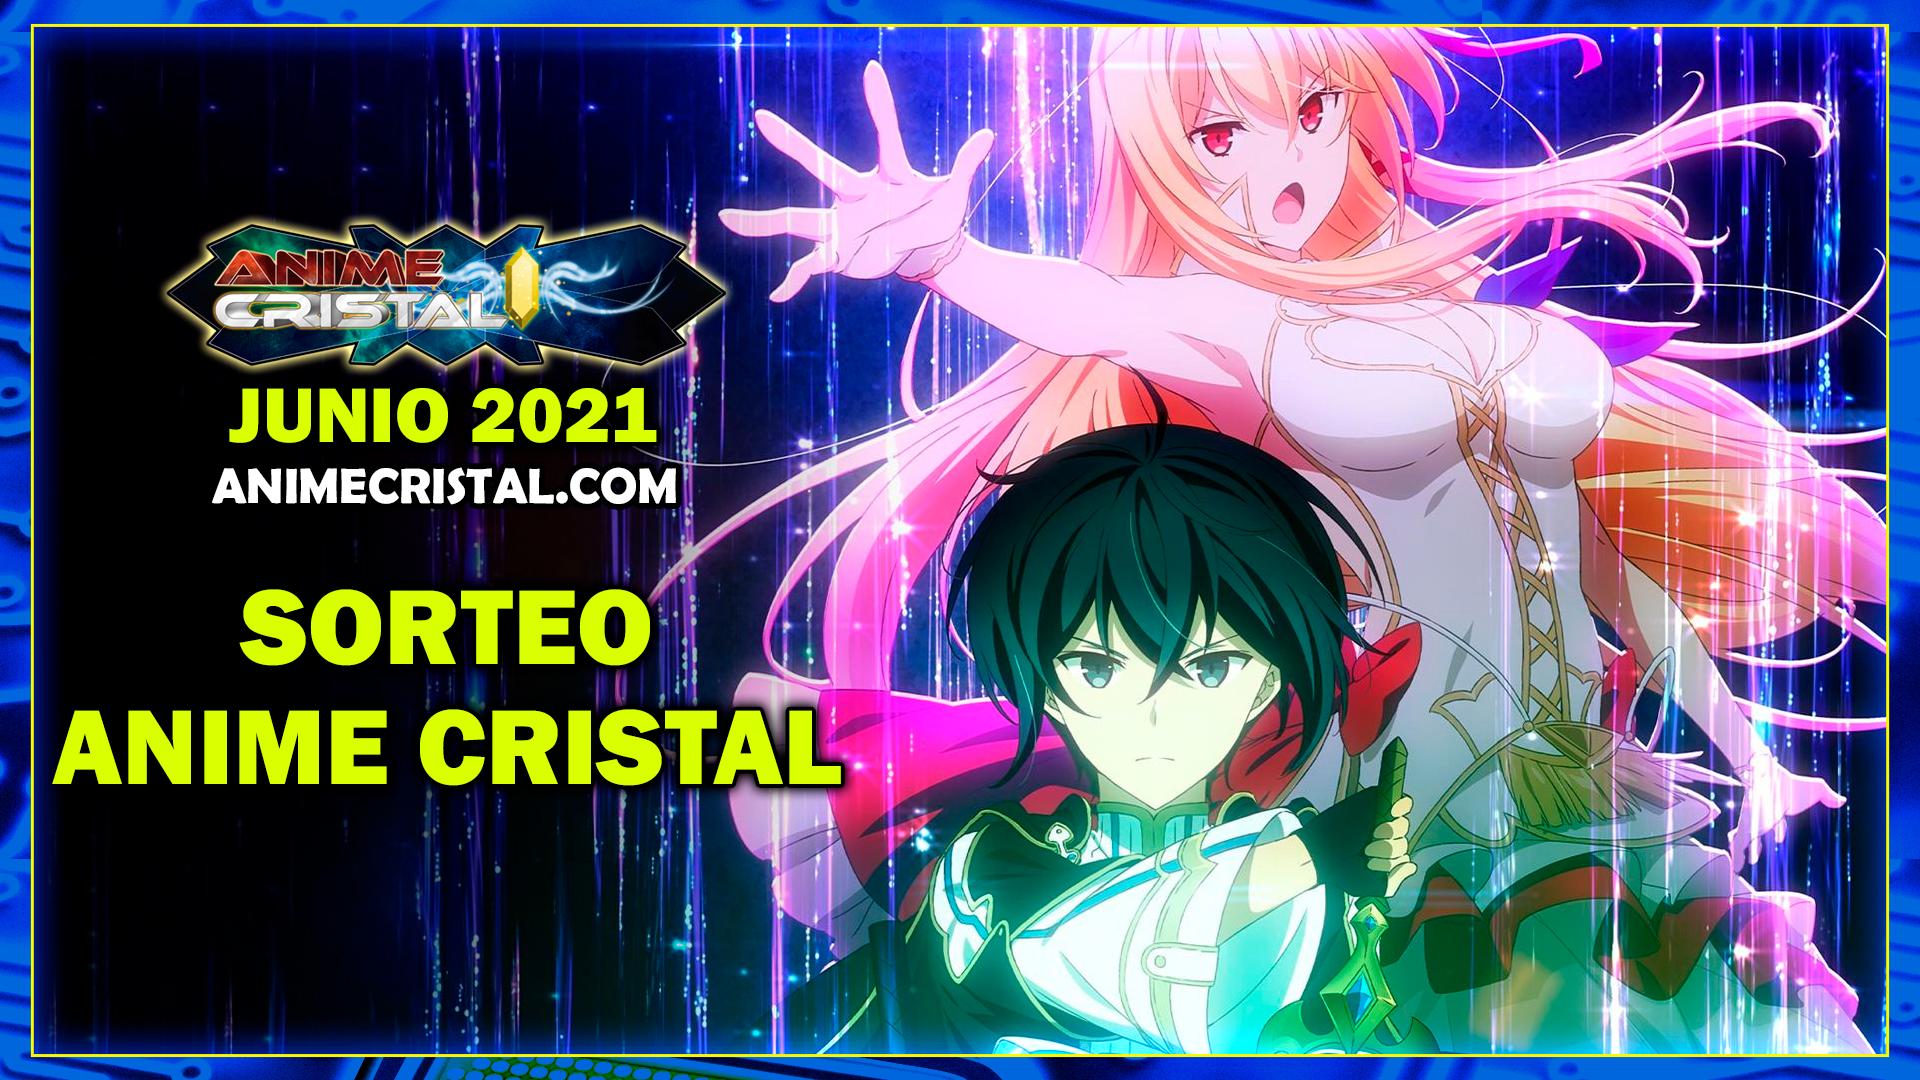 Sorteo Anime Cristal Junio 2021